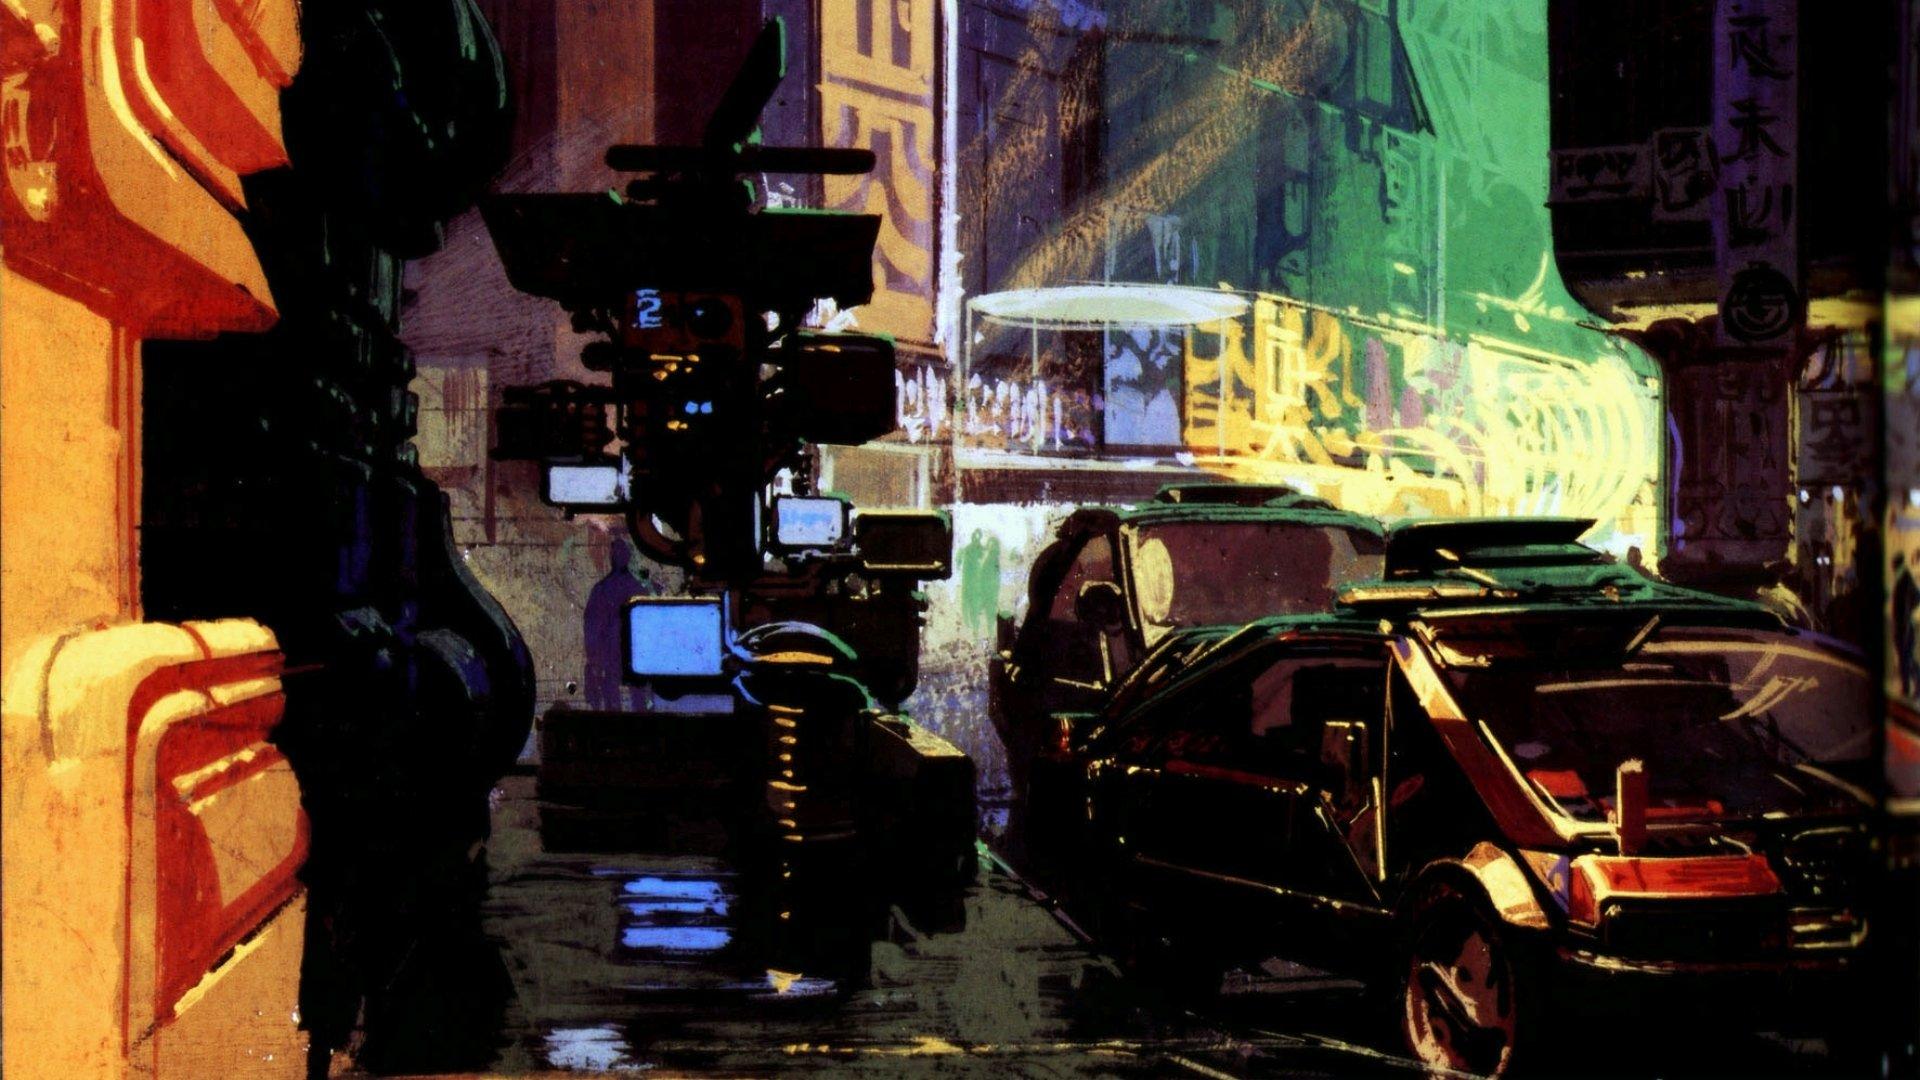 Blade Runner 2049 Wallpaper Iphone X Blade Runner Full Hd Wallpaper And Background Image